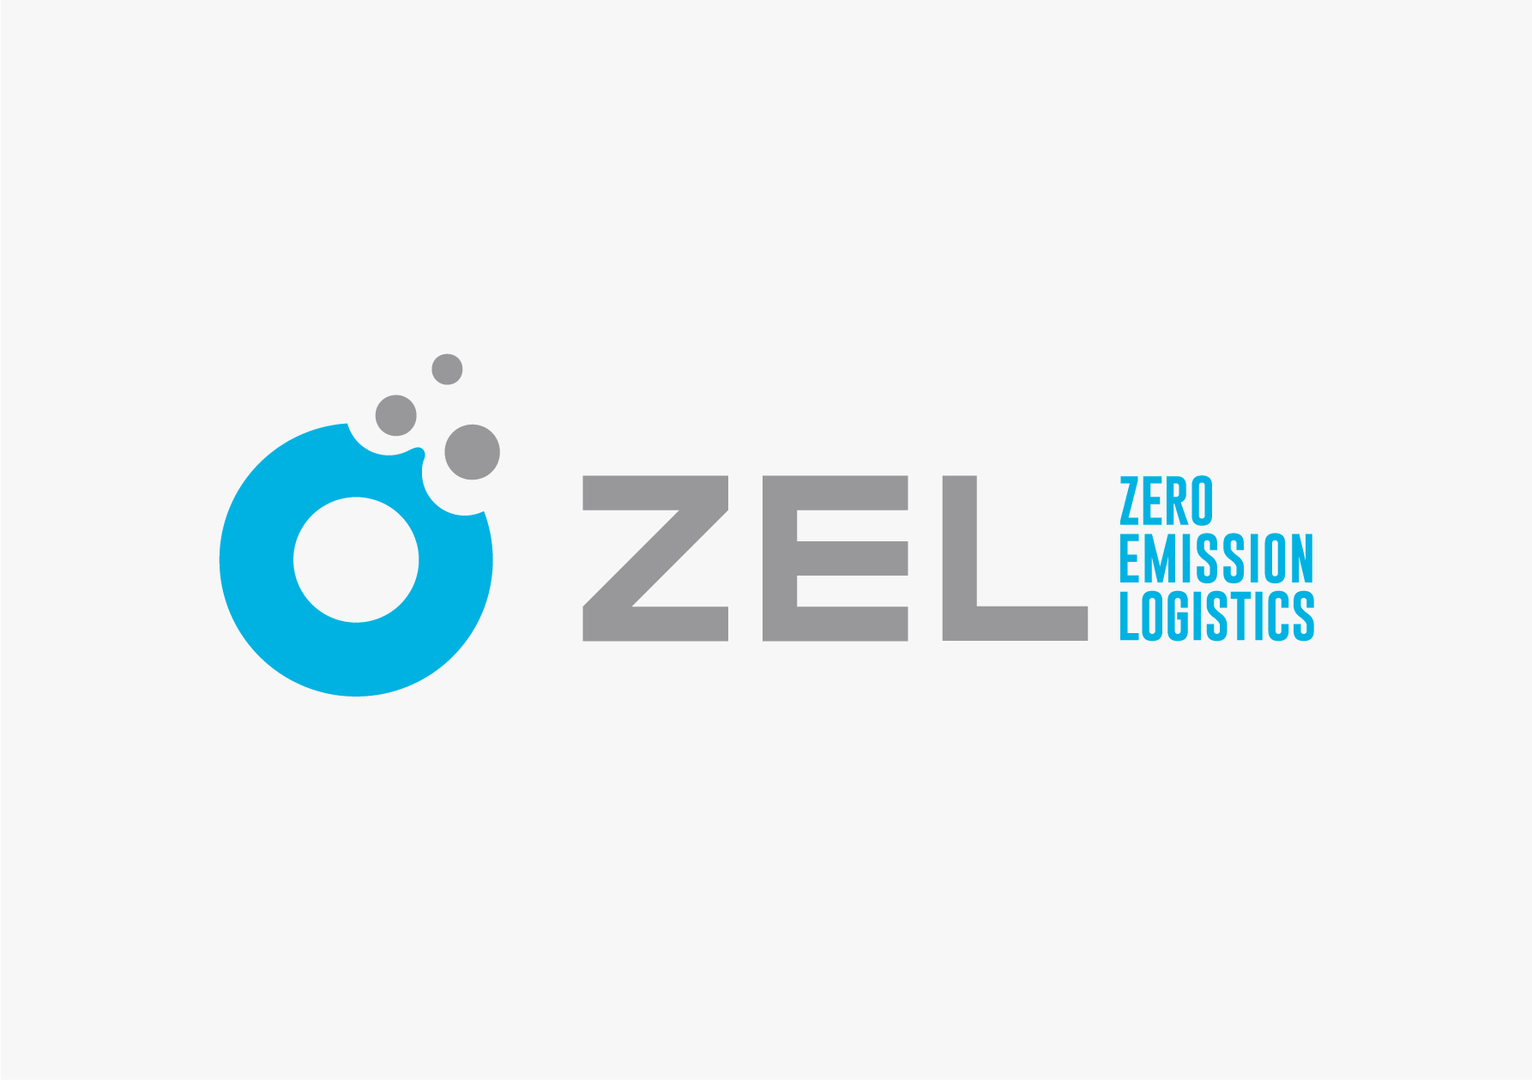 Zero Emission Logistics - transport